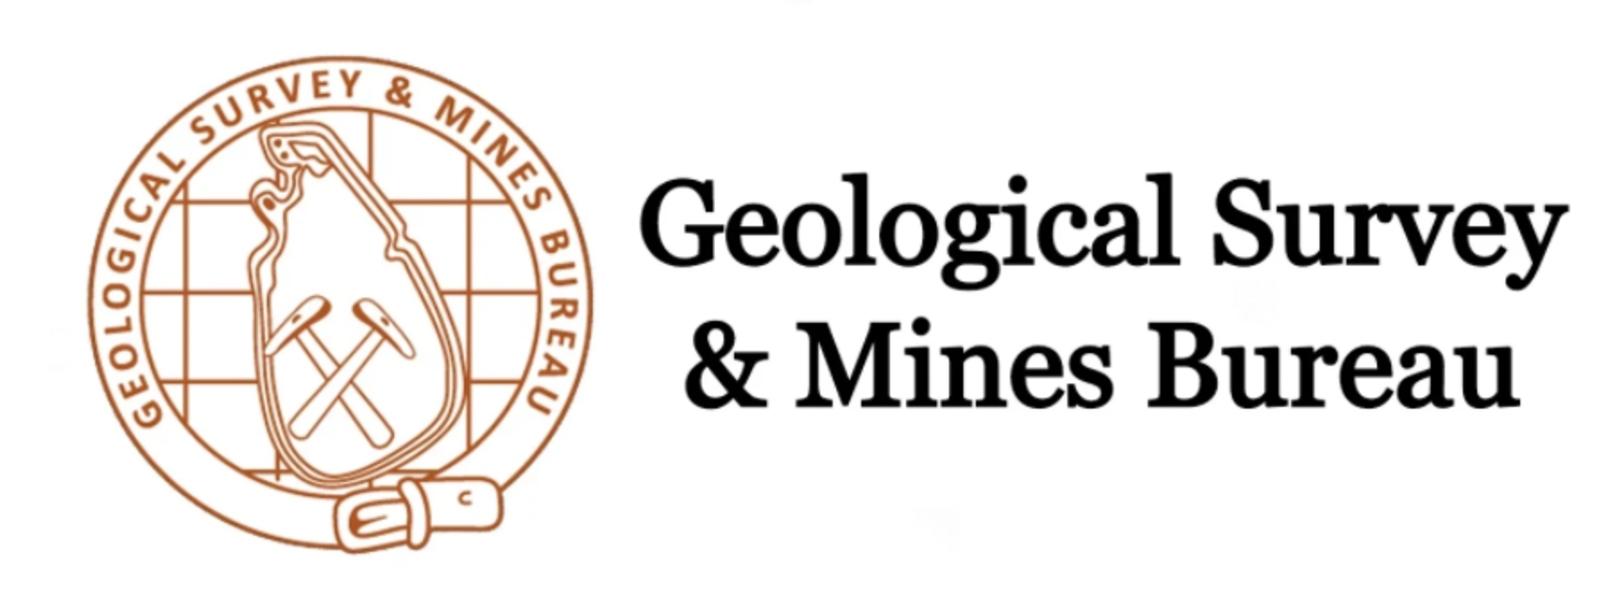 GEOLOGICAL SURVEY & MINES BUREAU TO INVESTIGATE SAND MINING IN MARAWILA